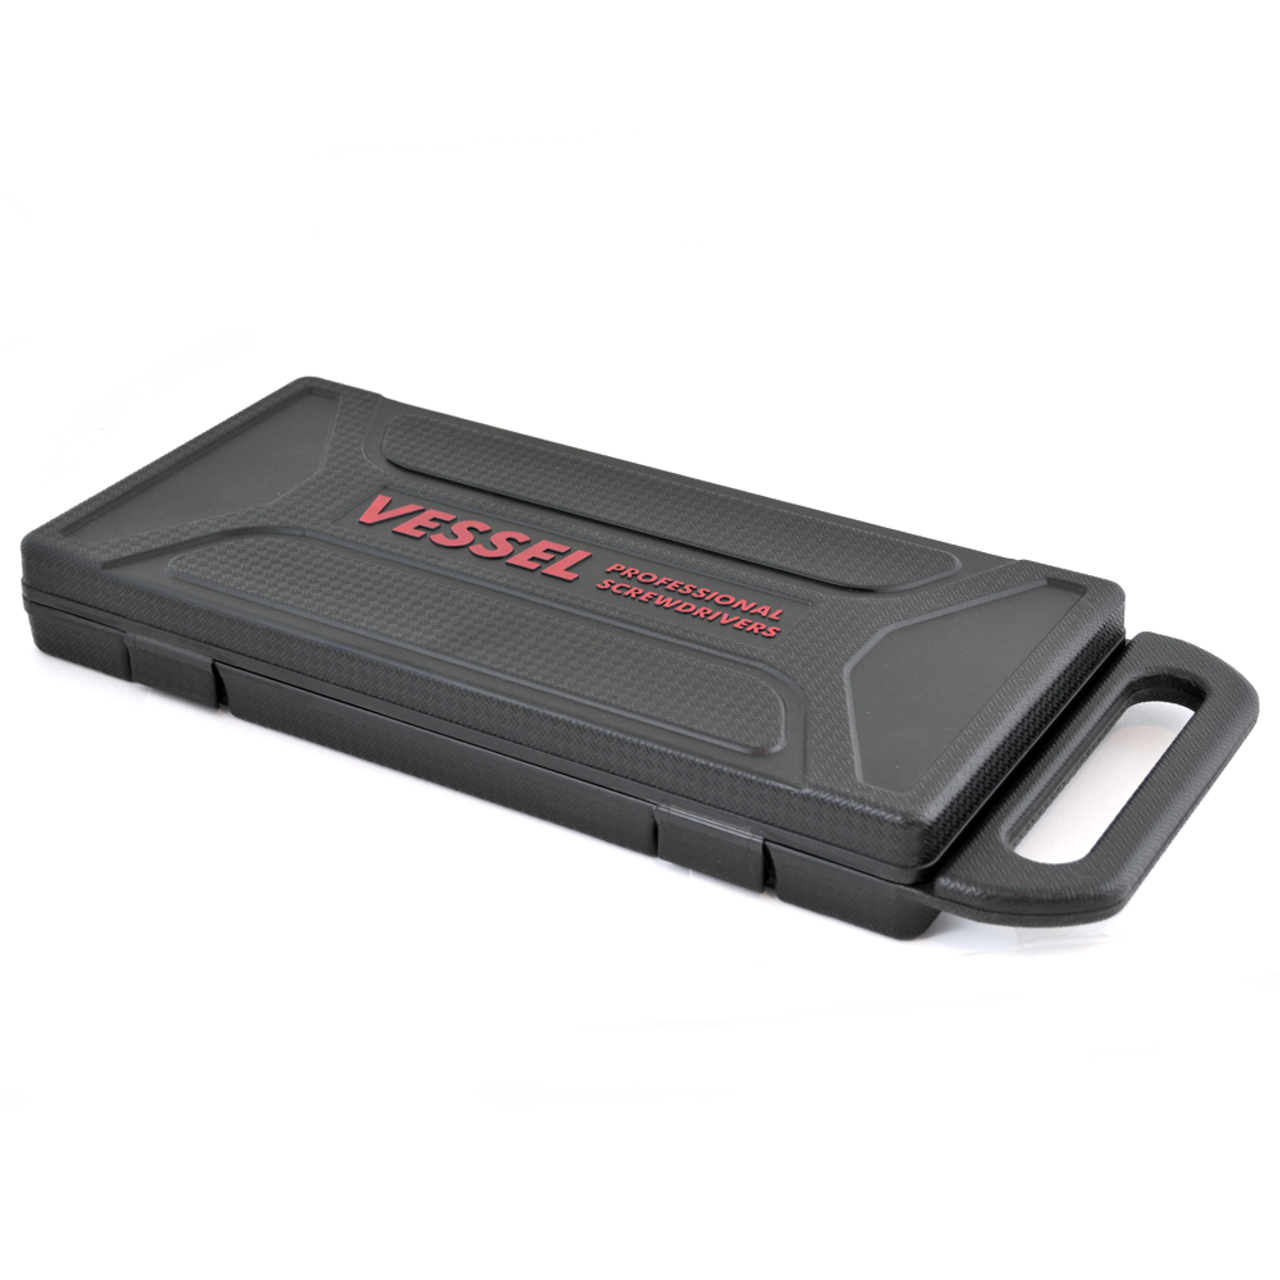 12-PC, Dual Tone Screwdriver Set (With Storage Case) (VES-4012PS)